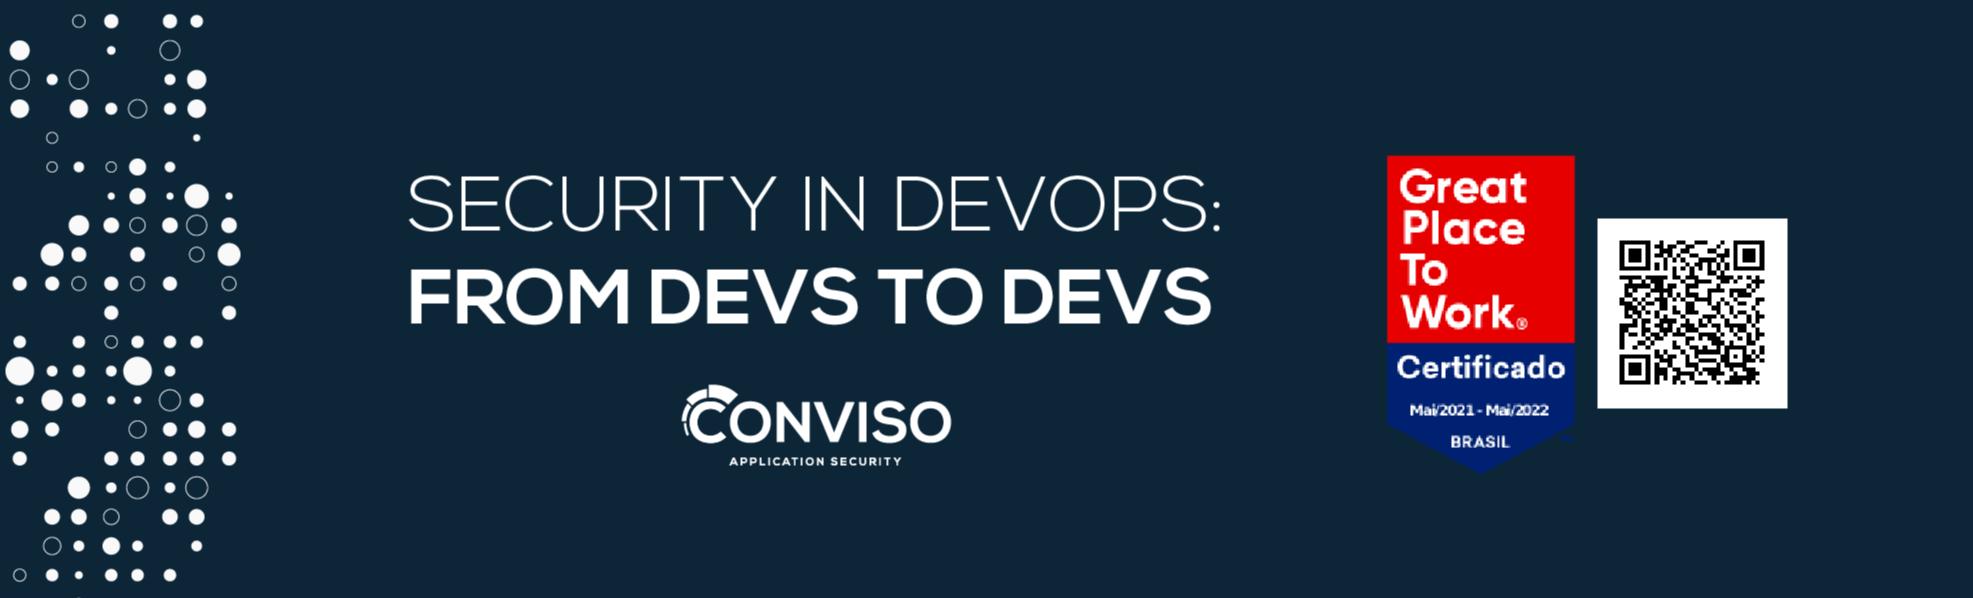 Conviso Application Security